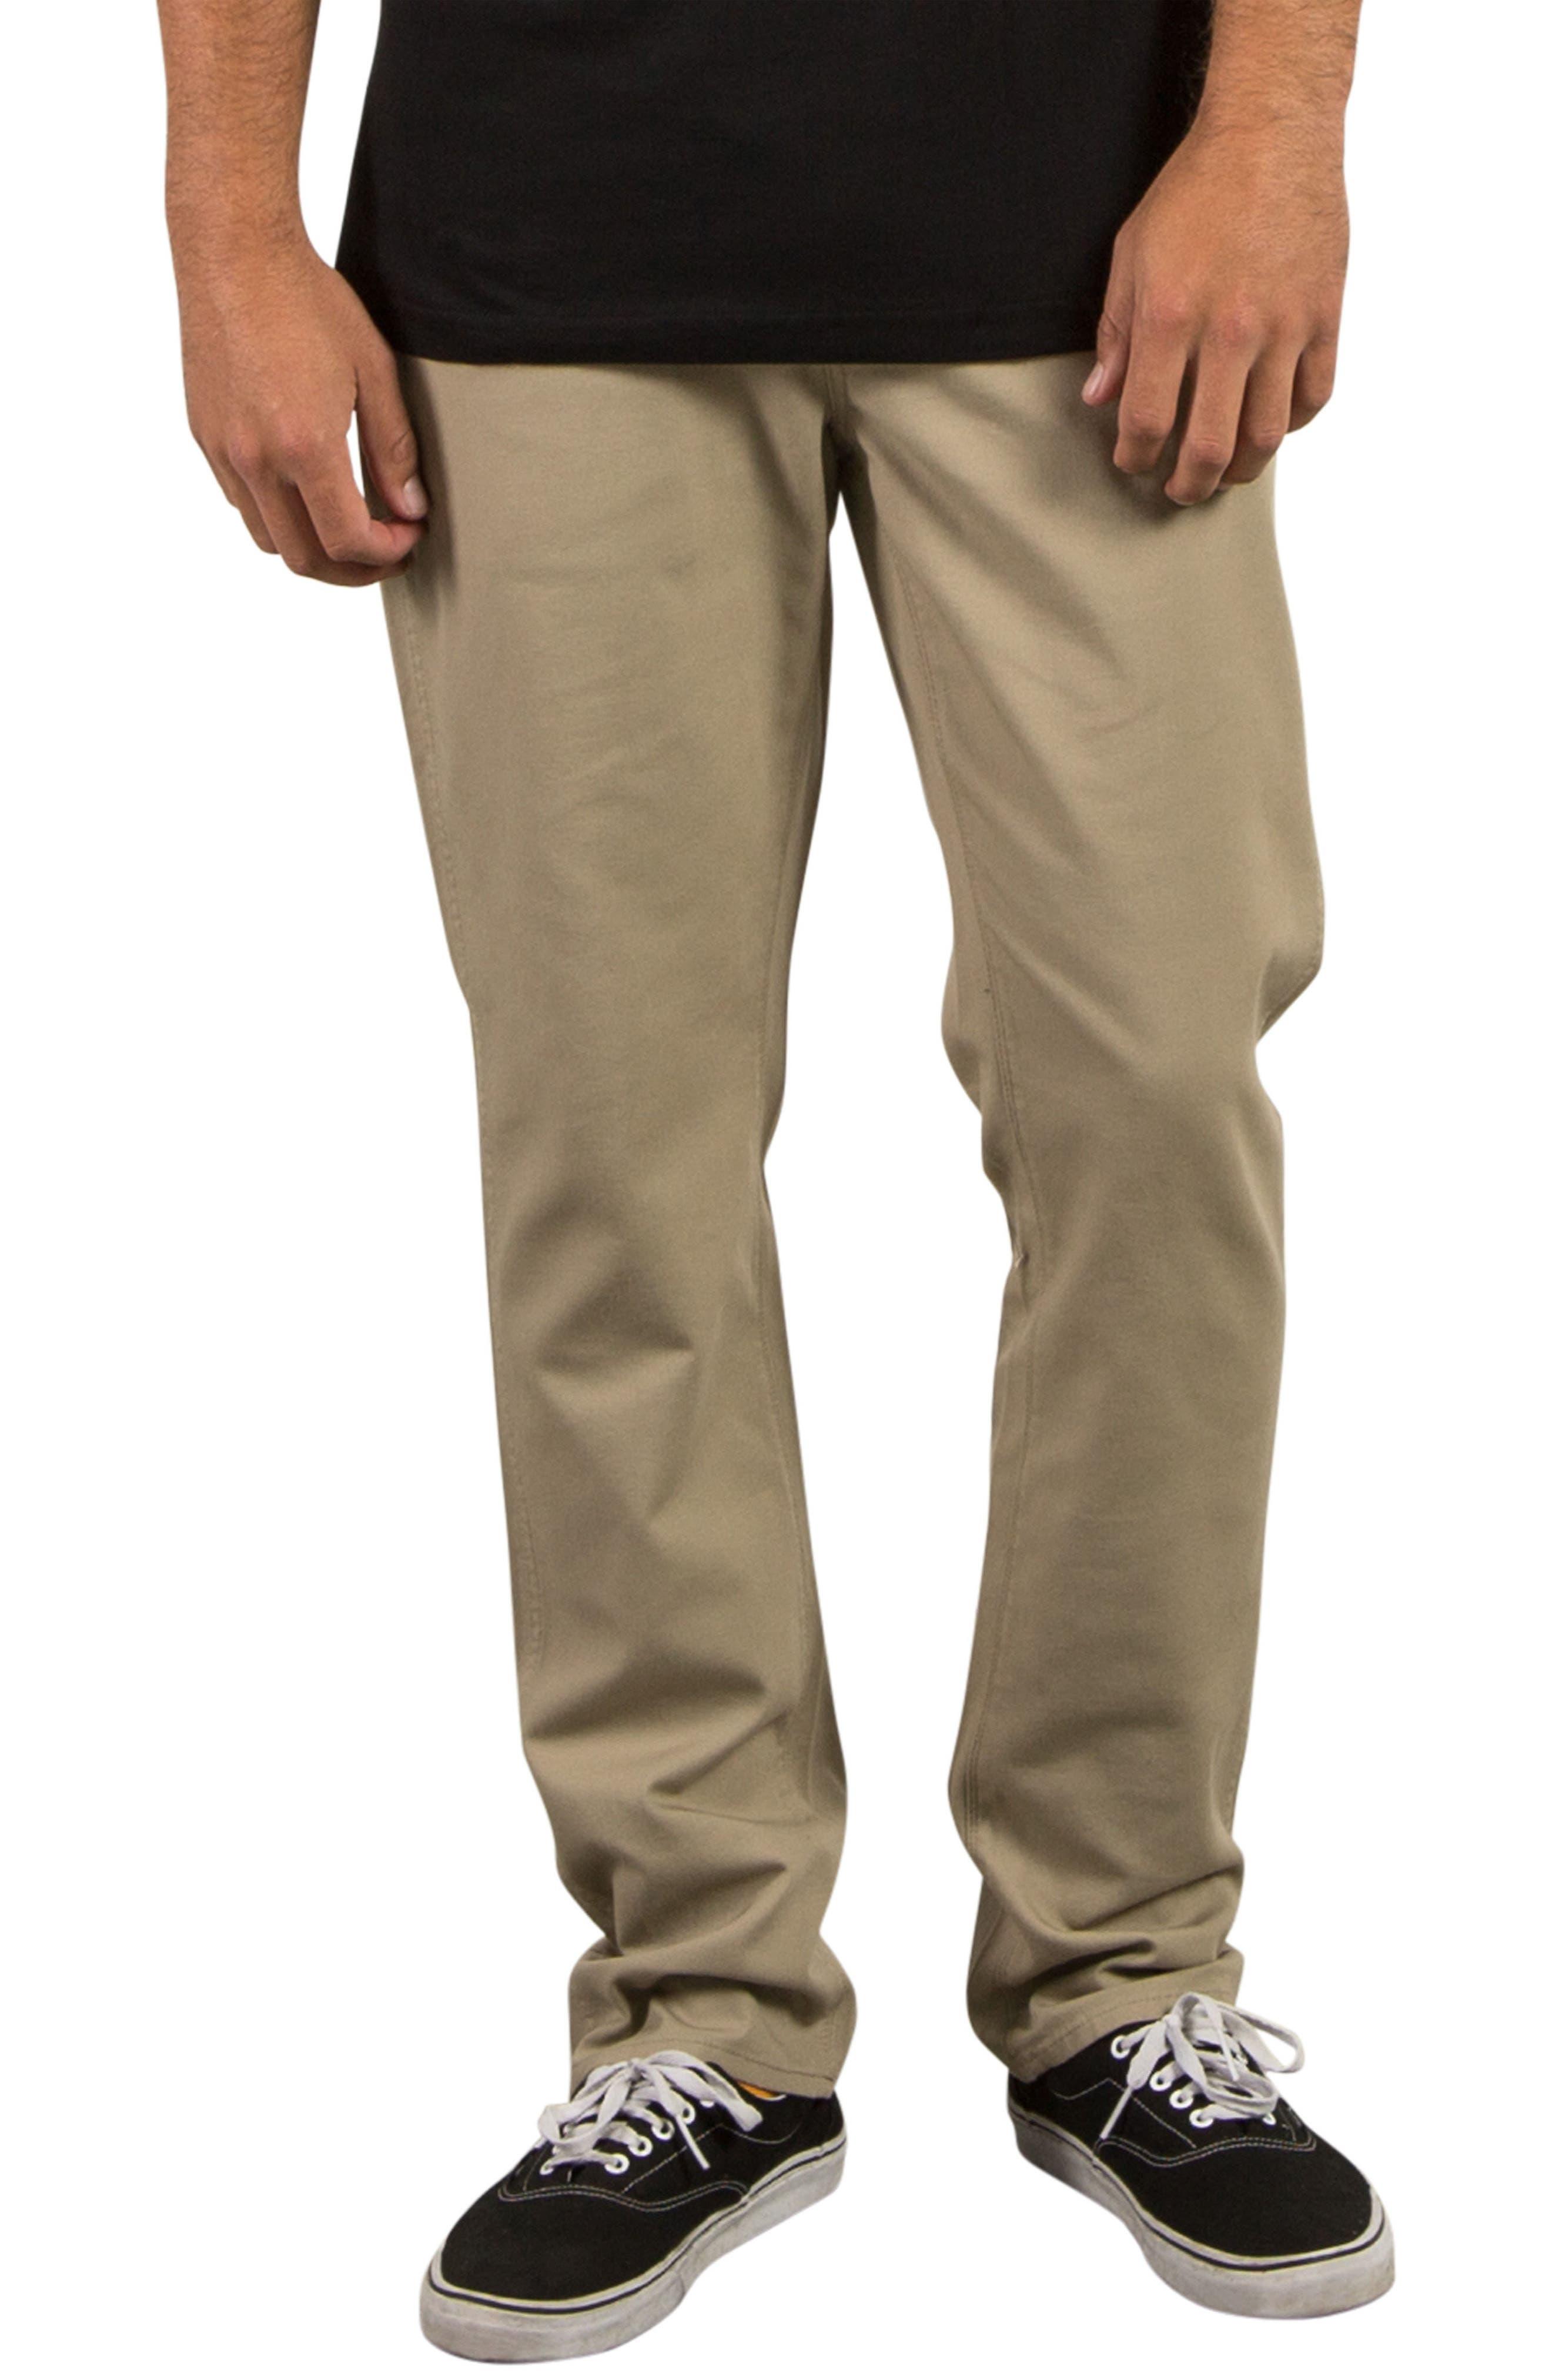 VSM Gritter Slim Chinos,                         Main,                         color, Khaki